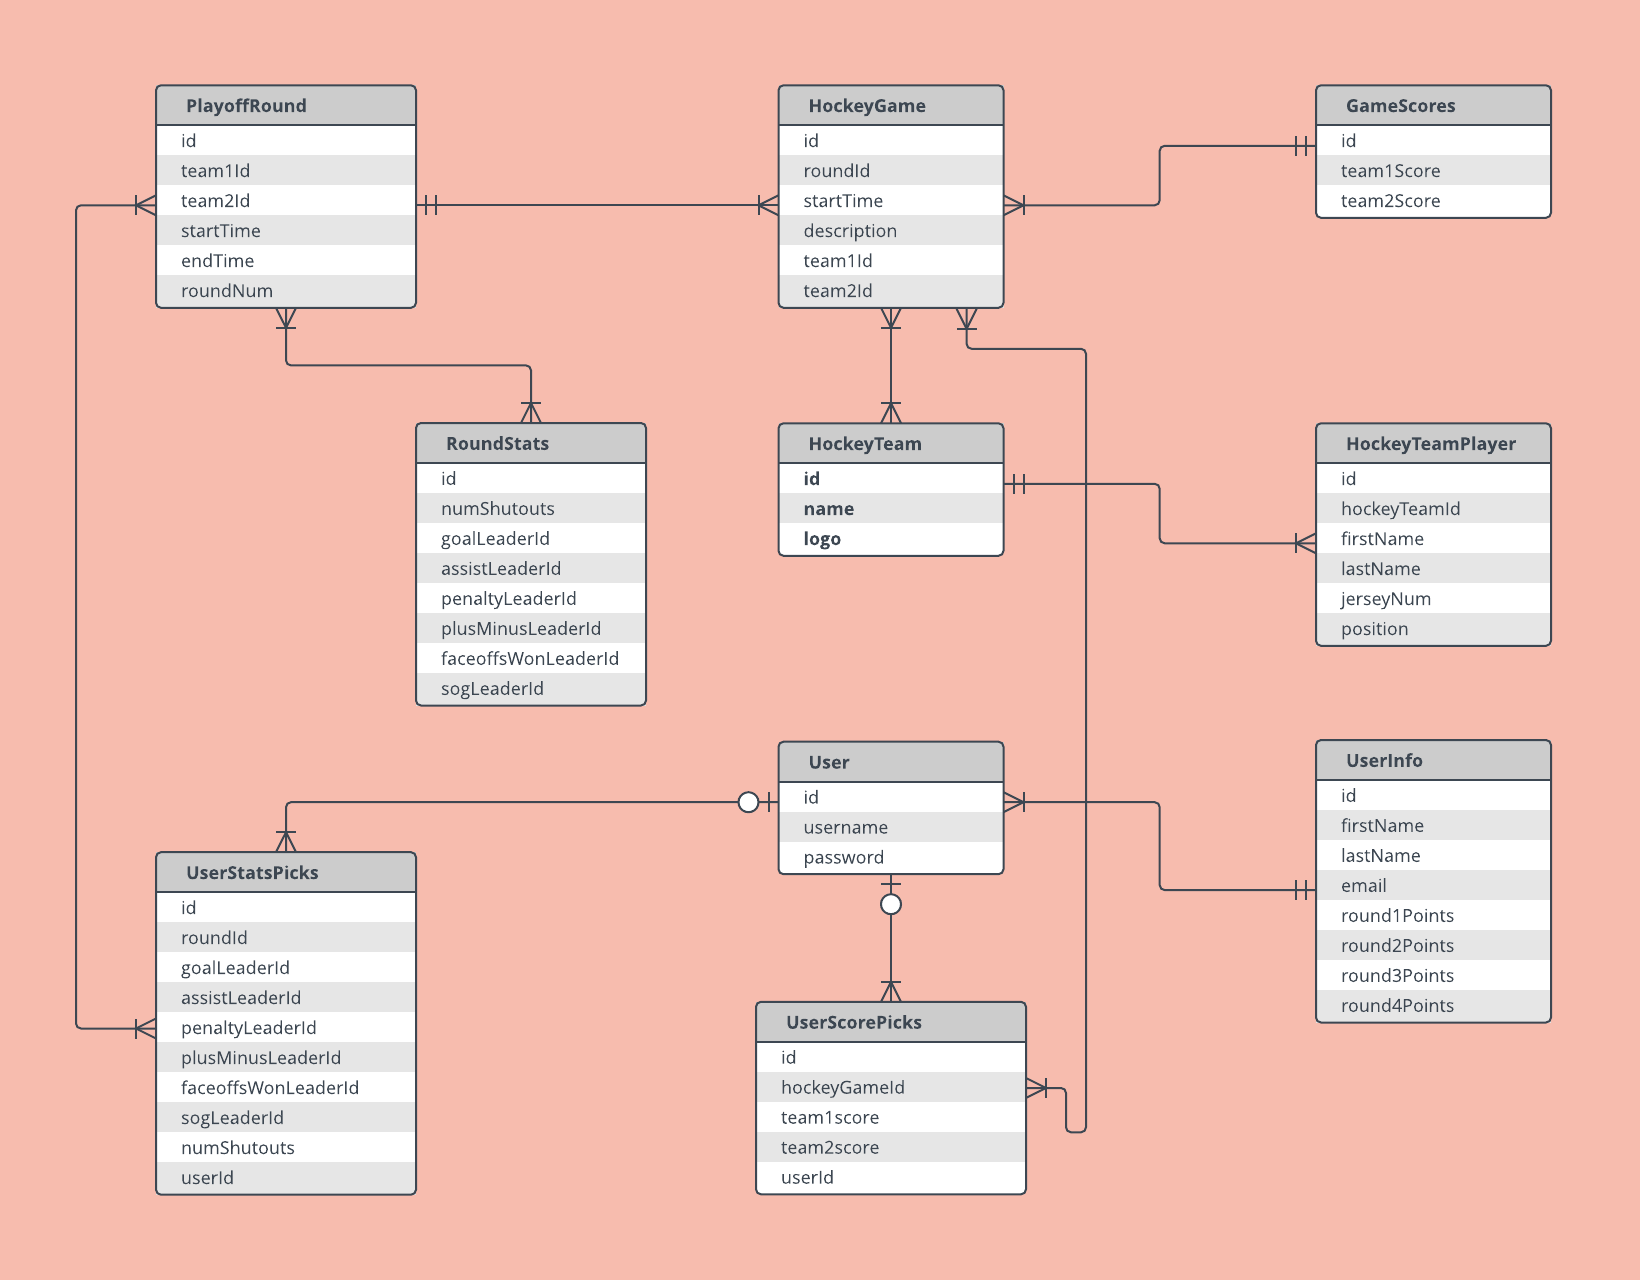 erdiagramexample